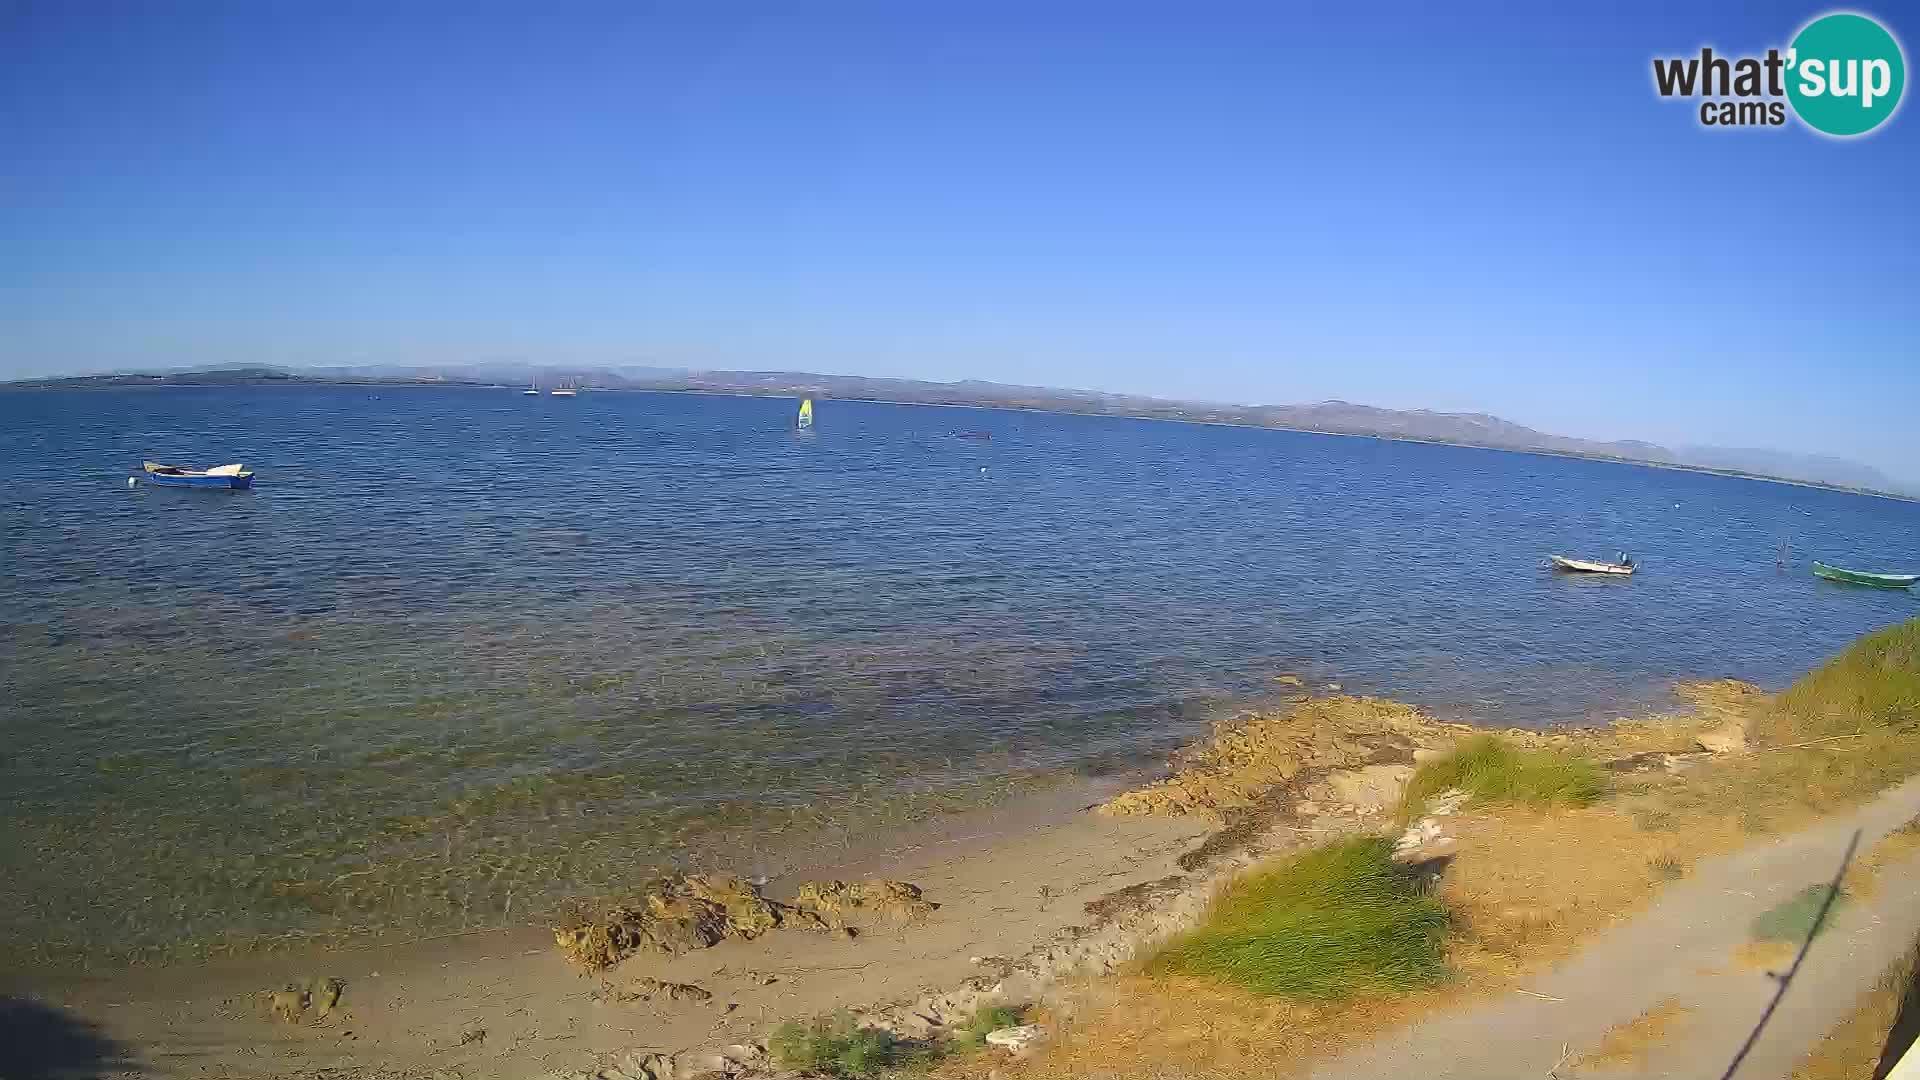 Windsurfing Club Sa Barra spletna kamera Sant'Antioco – Sardinija – Italija